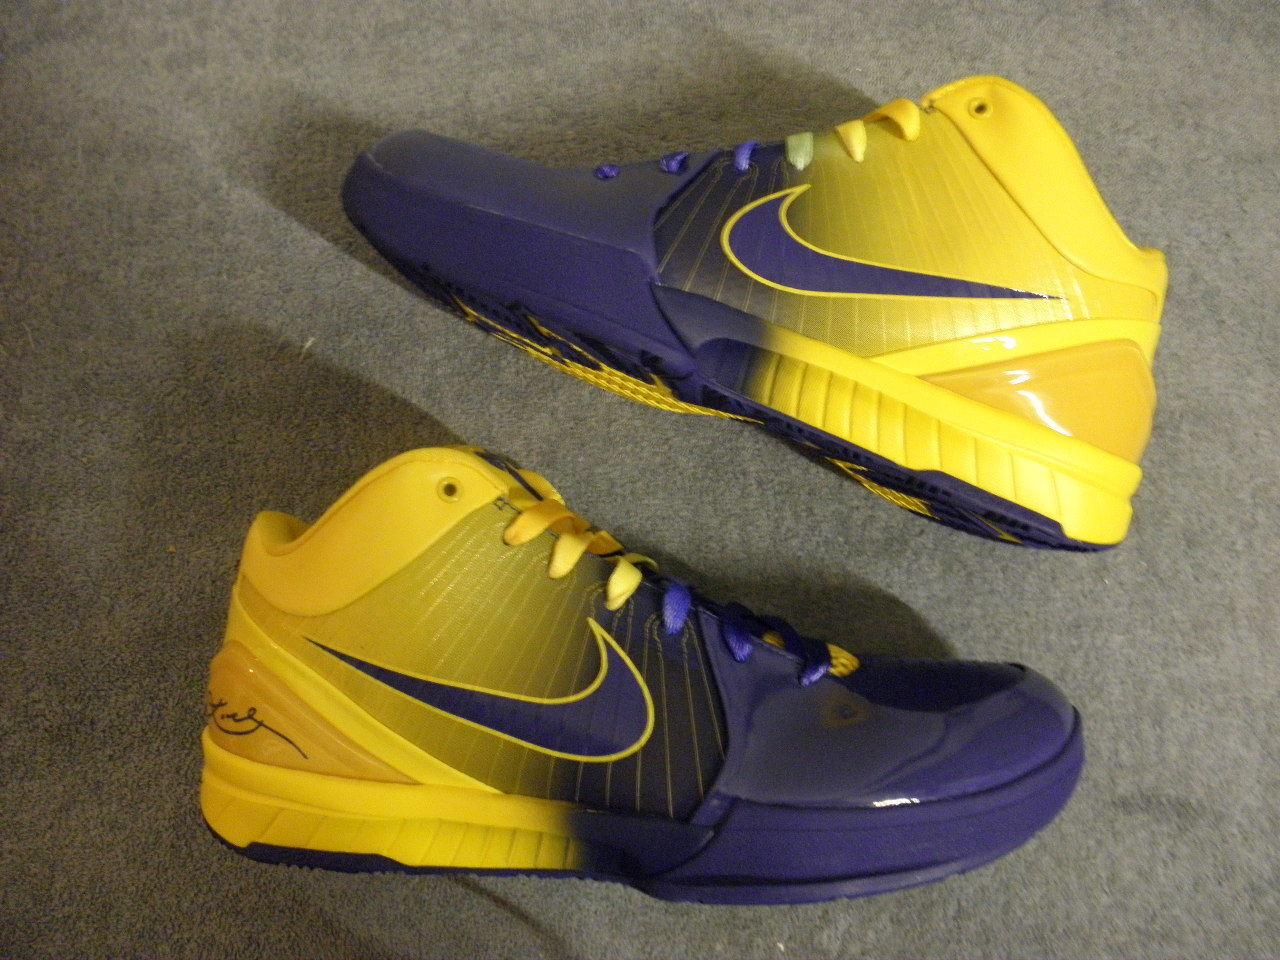 Nike Nike Nike air zoom kobe iv 4 vier ringen lakers 11 ds neue nib og original selten pe 801285